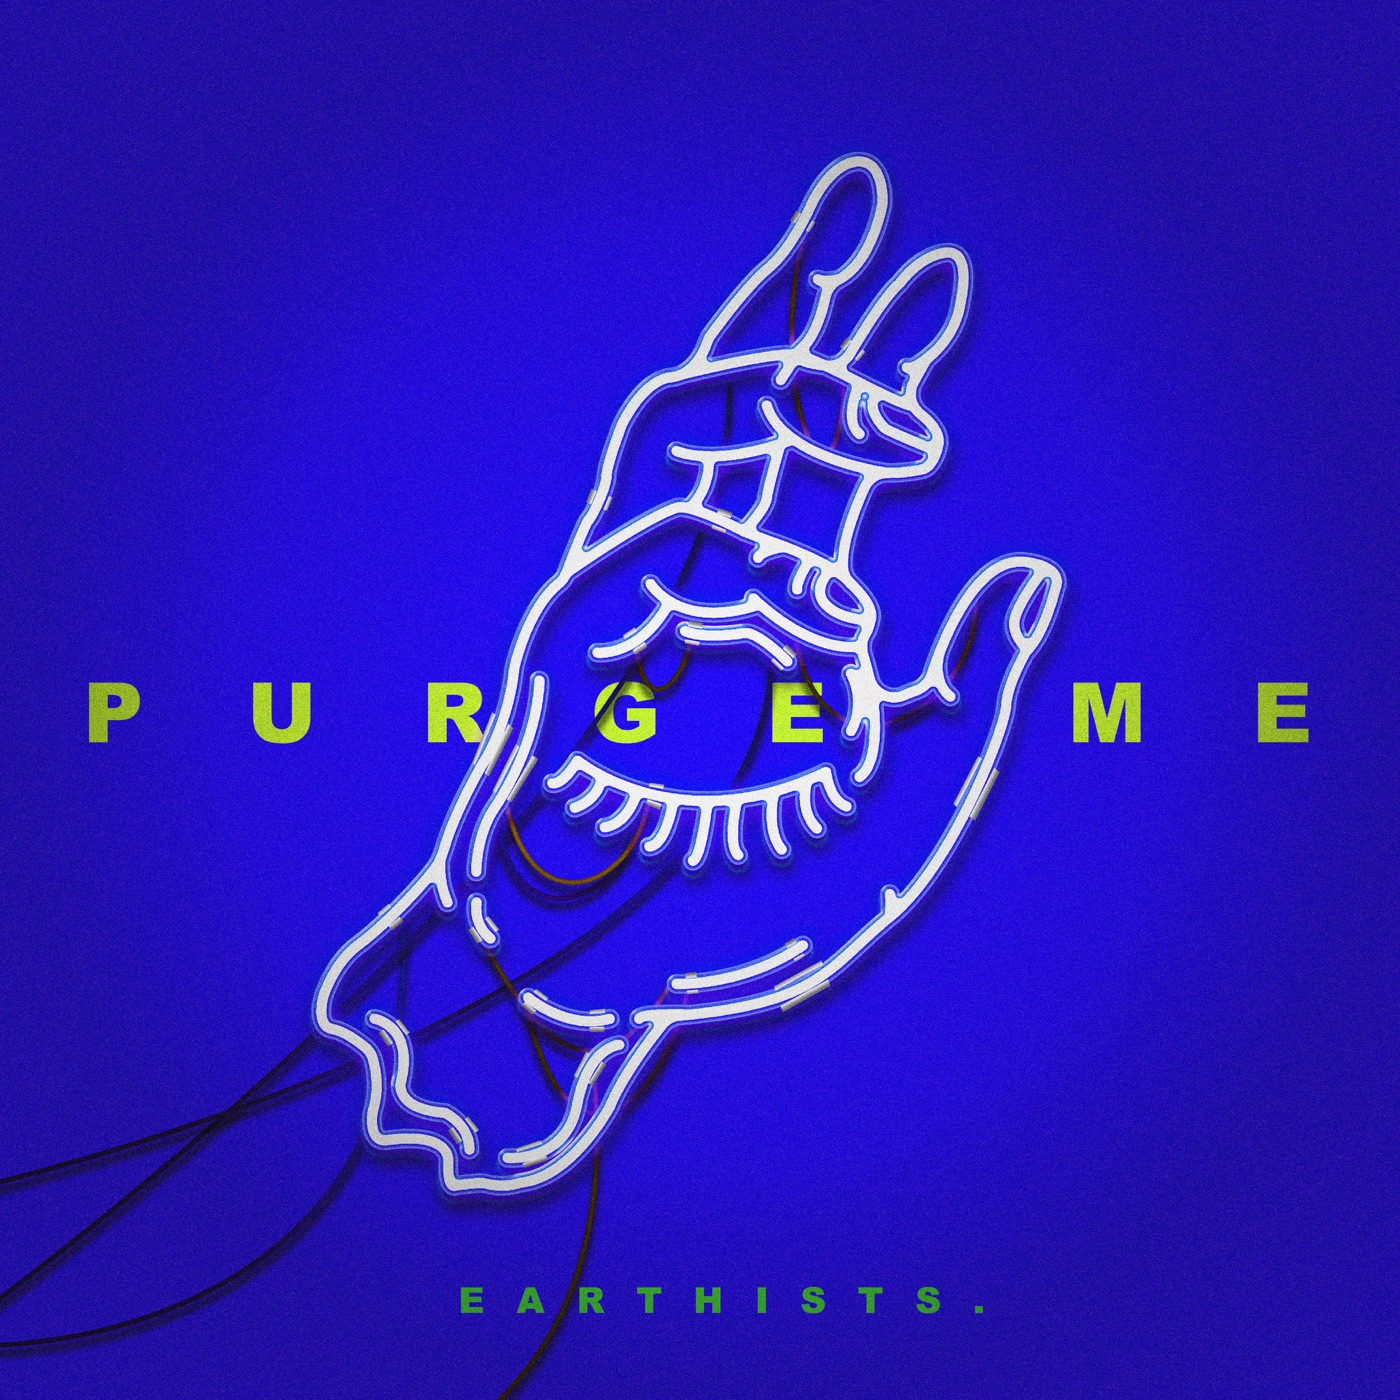 Earthists. - Purge Me [single] (2019)